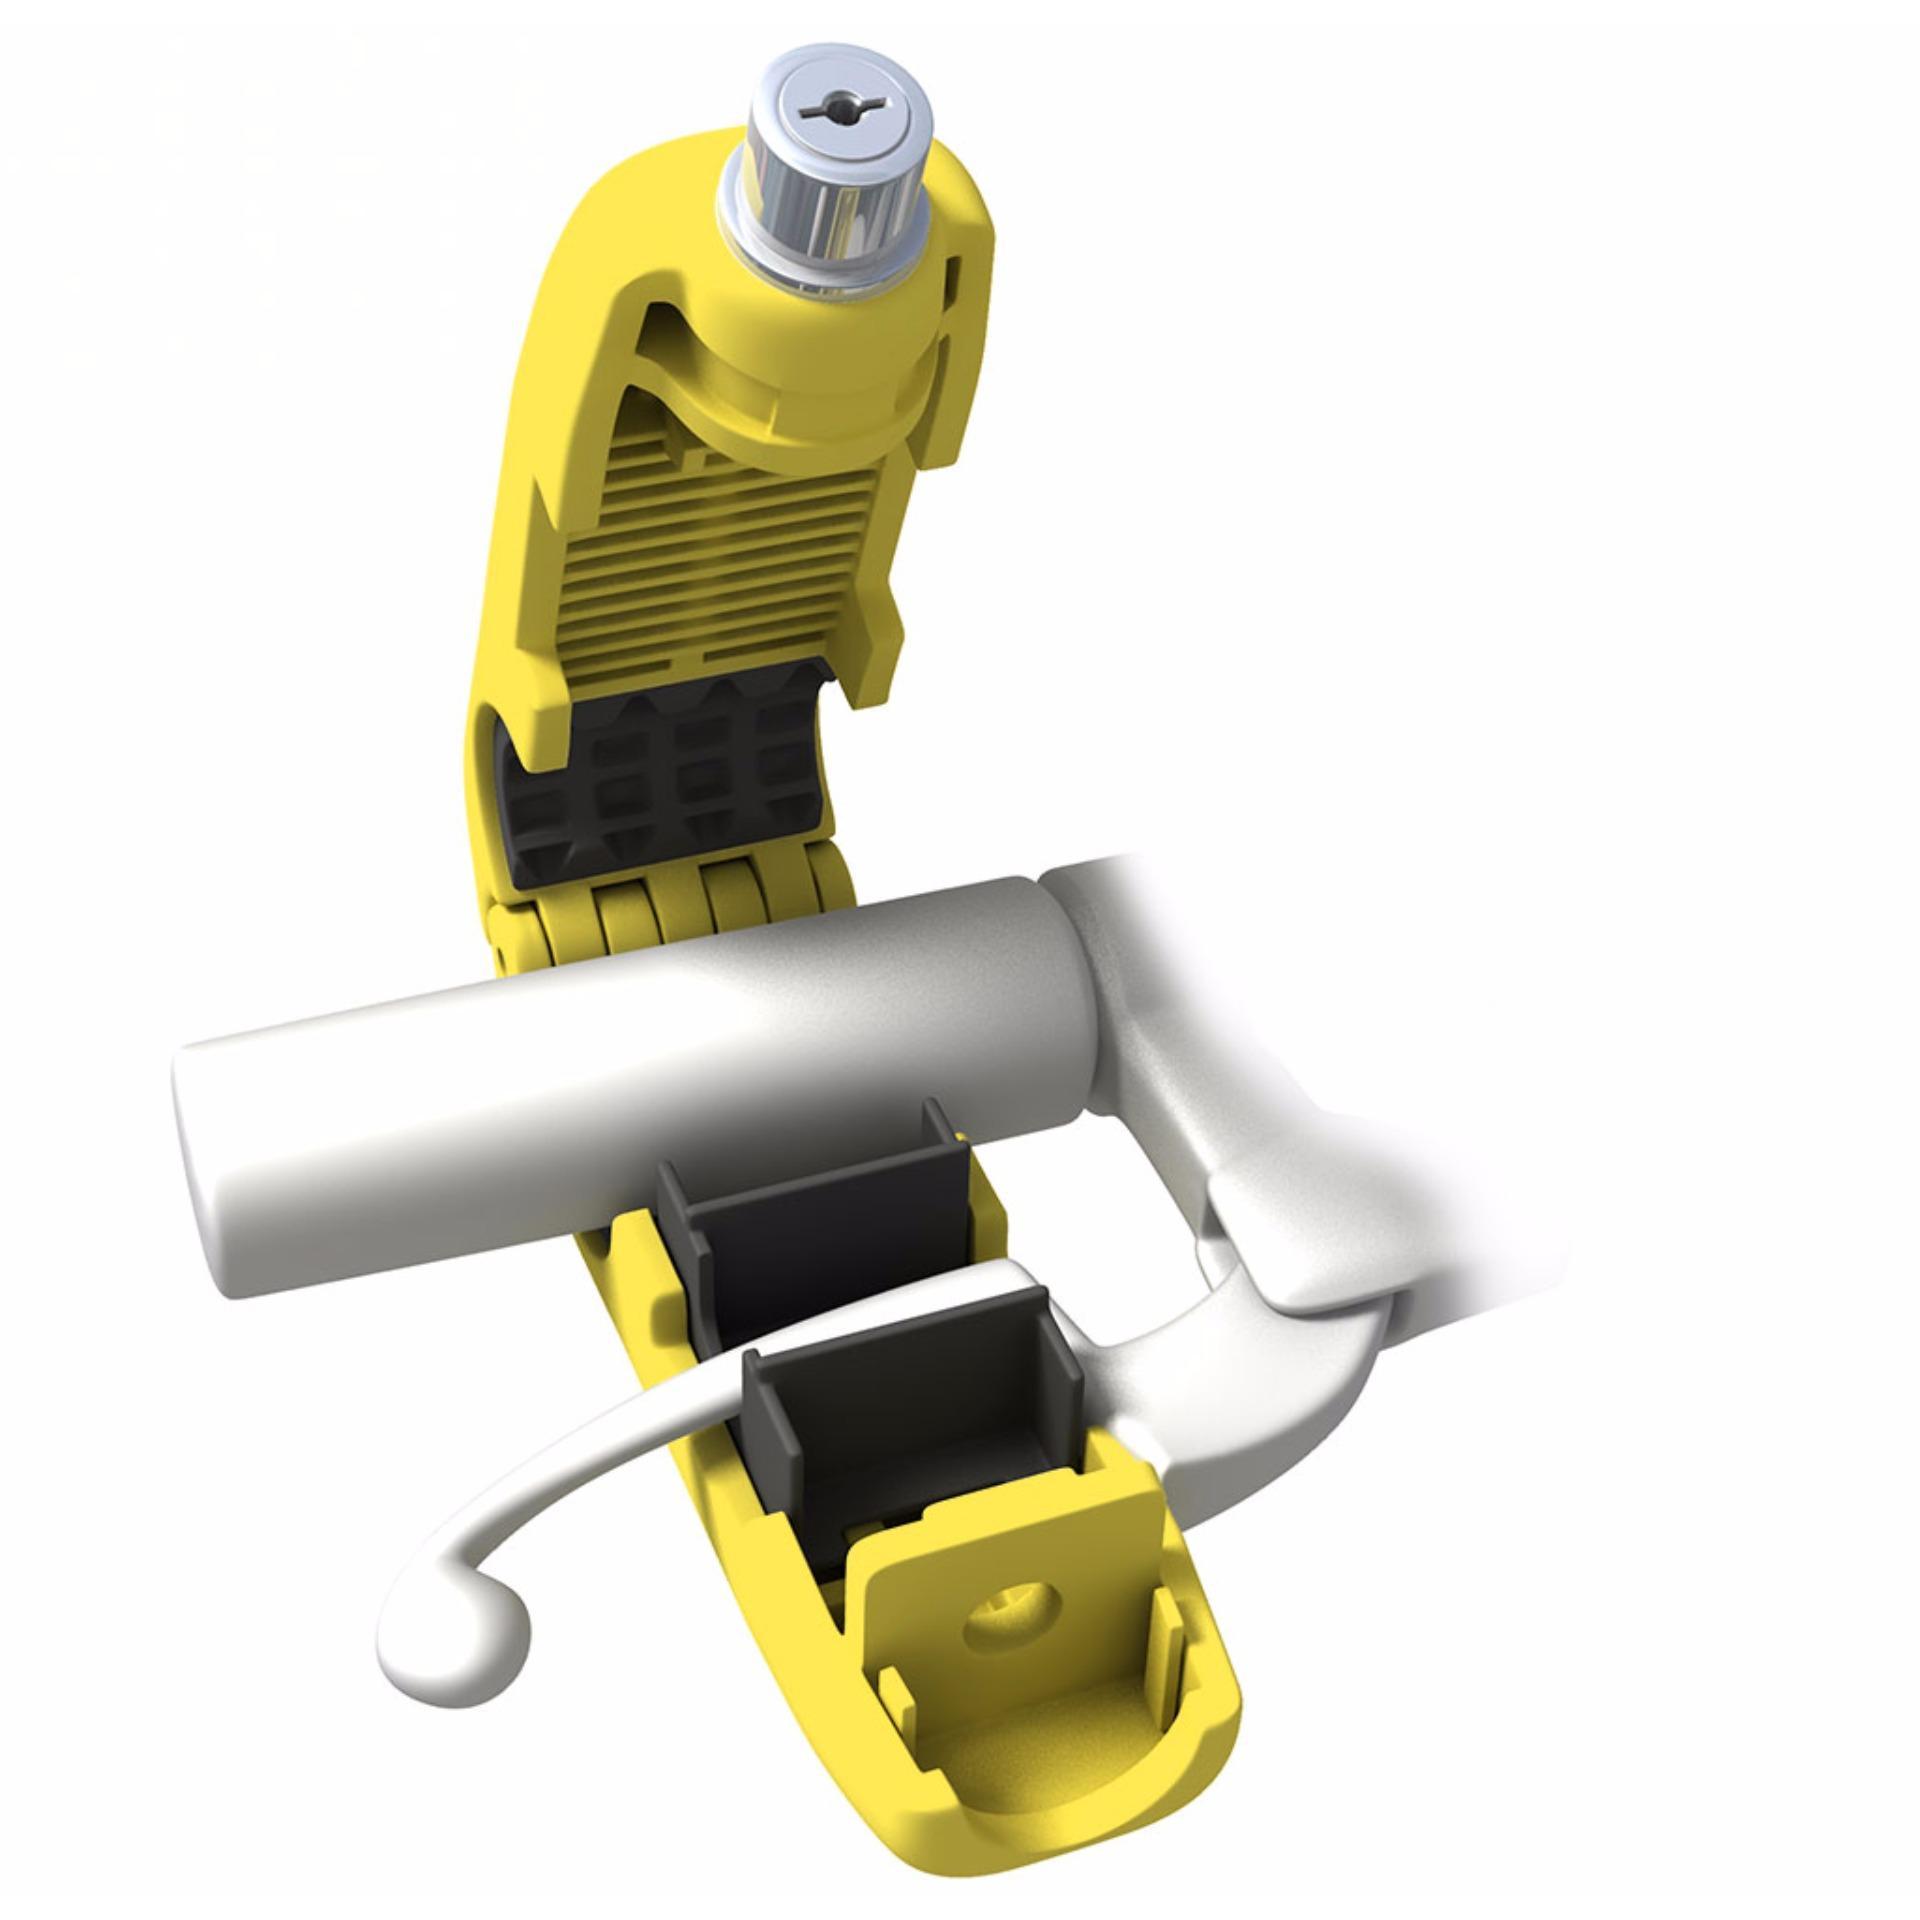 Cari Bandingkan Kunci Pengaman Motor High Quality Griplock Grip Lock Ganda Untuk Semua Jenis